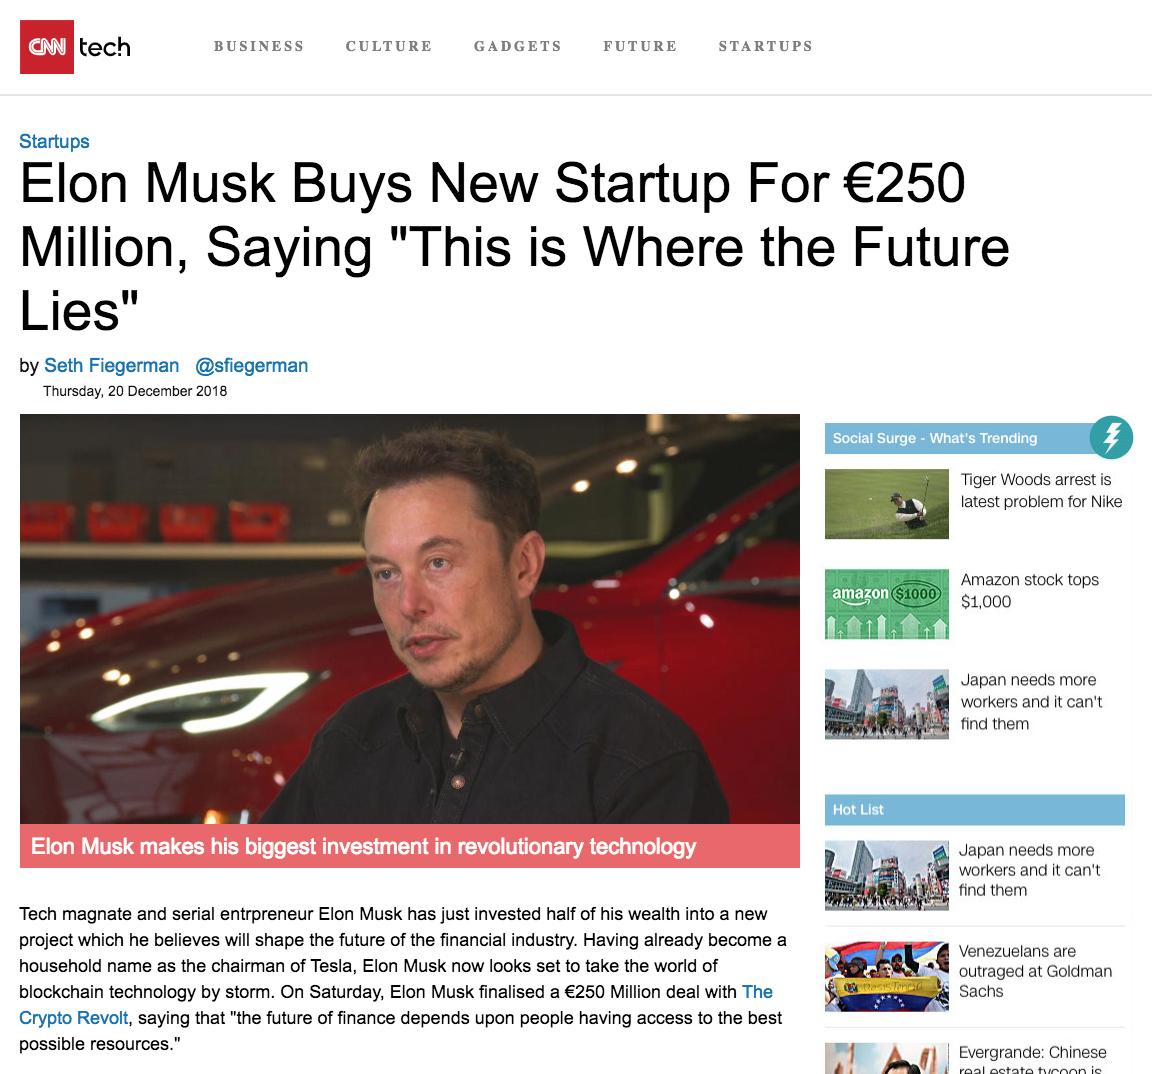 False news article about Elon Musk.